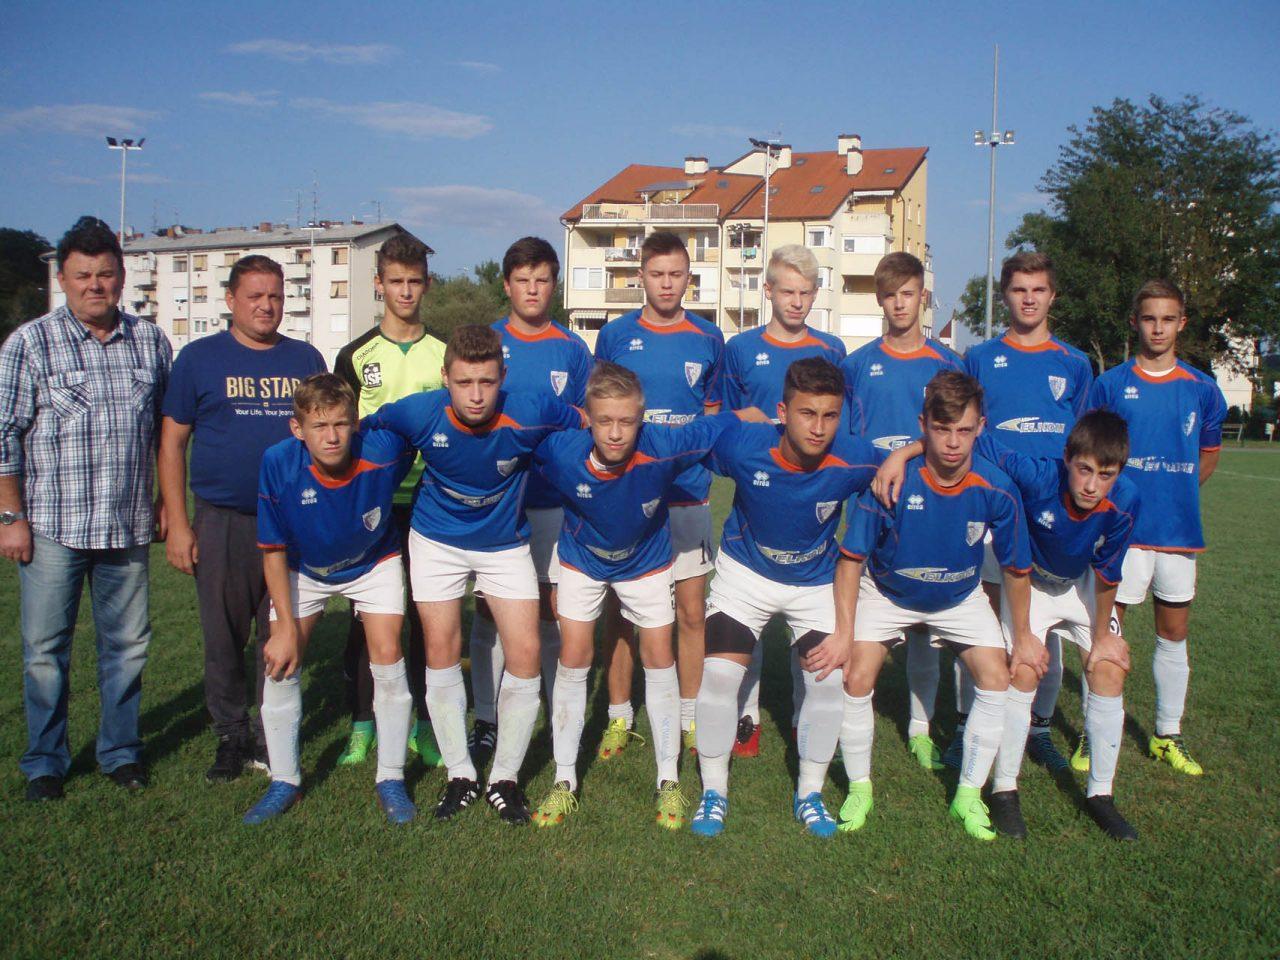 NK-Ivančica-Ivanec-juniori-1280x960.jpg